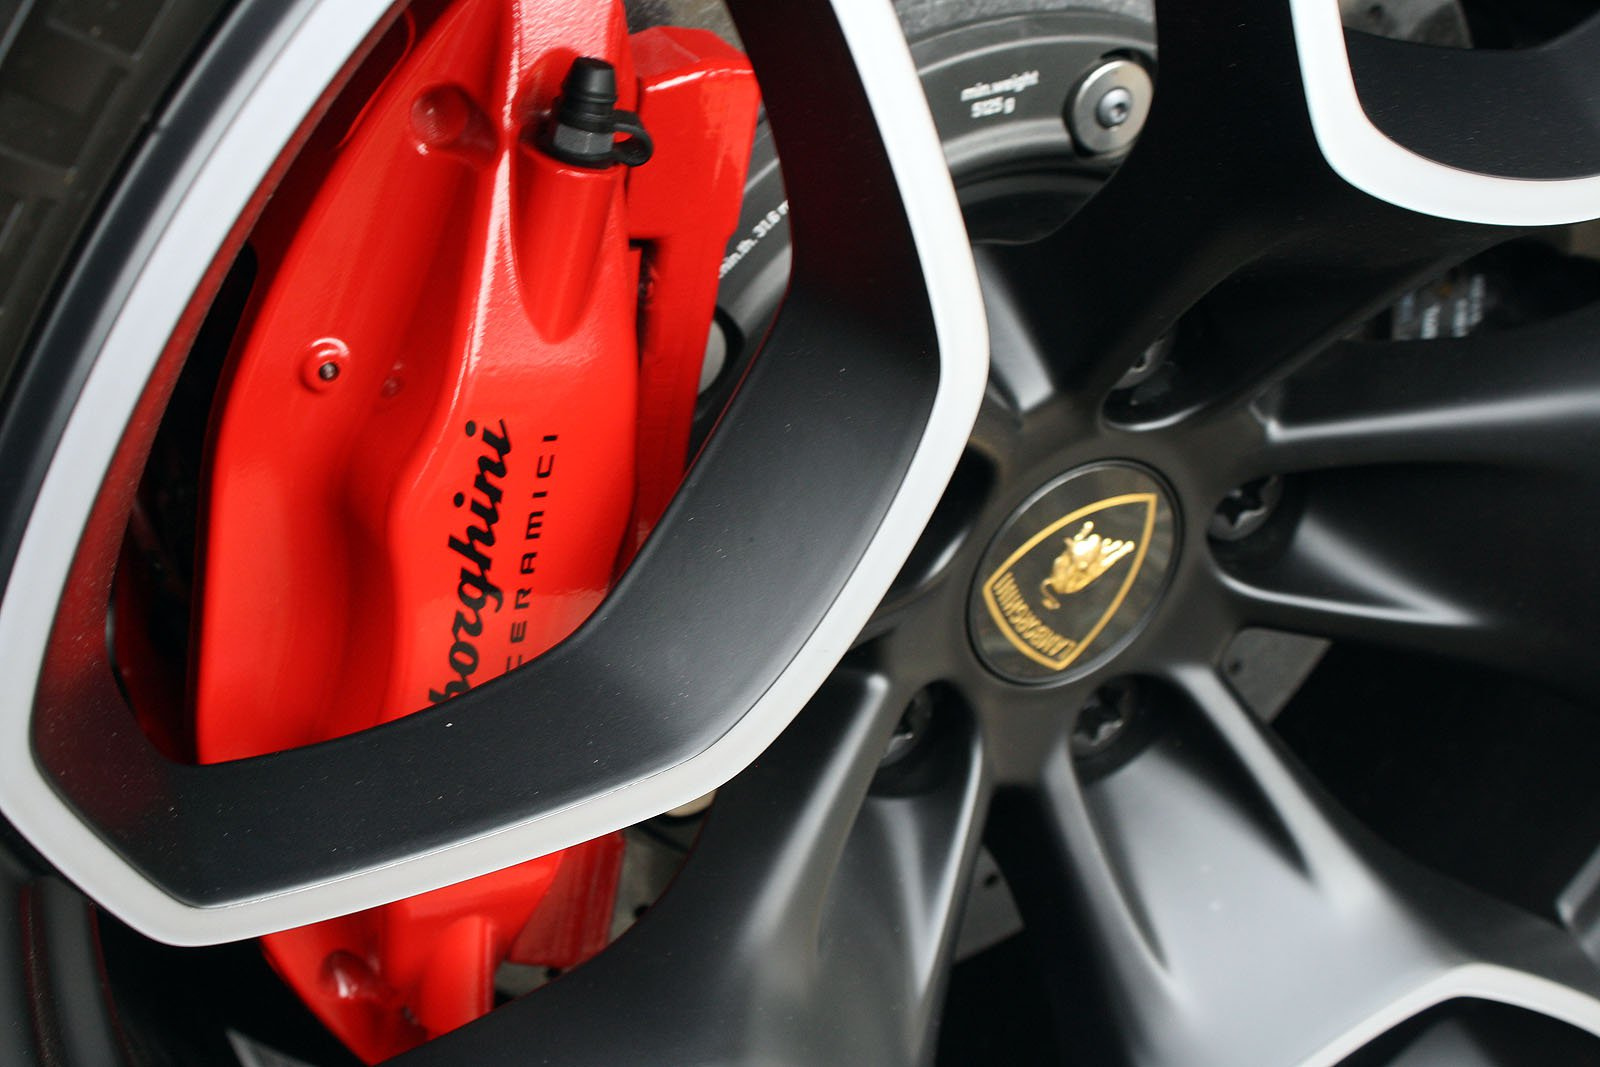 Lamborghini-ACSL-Grand-Opening-11